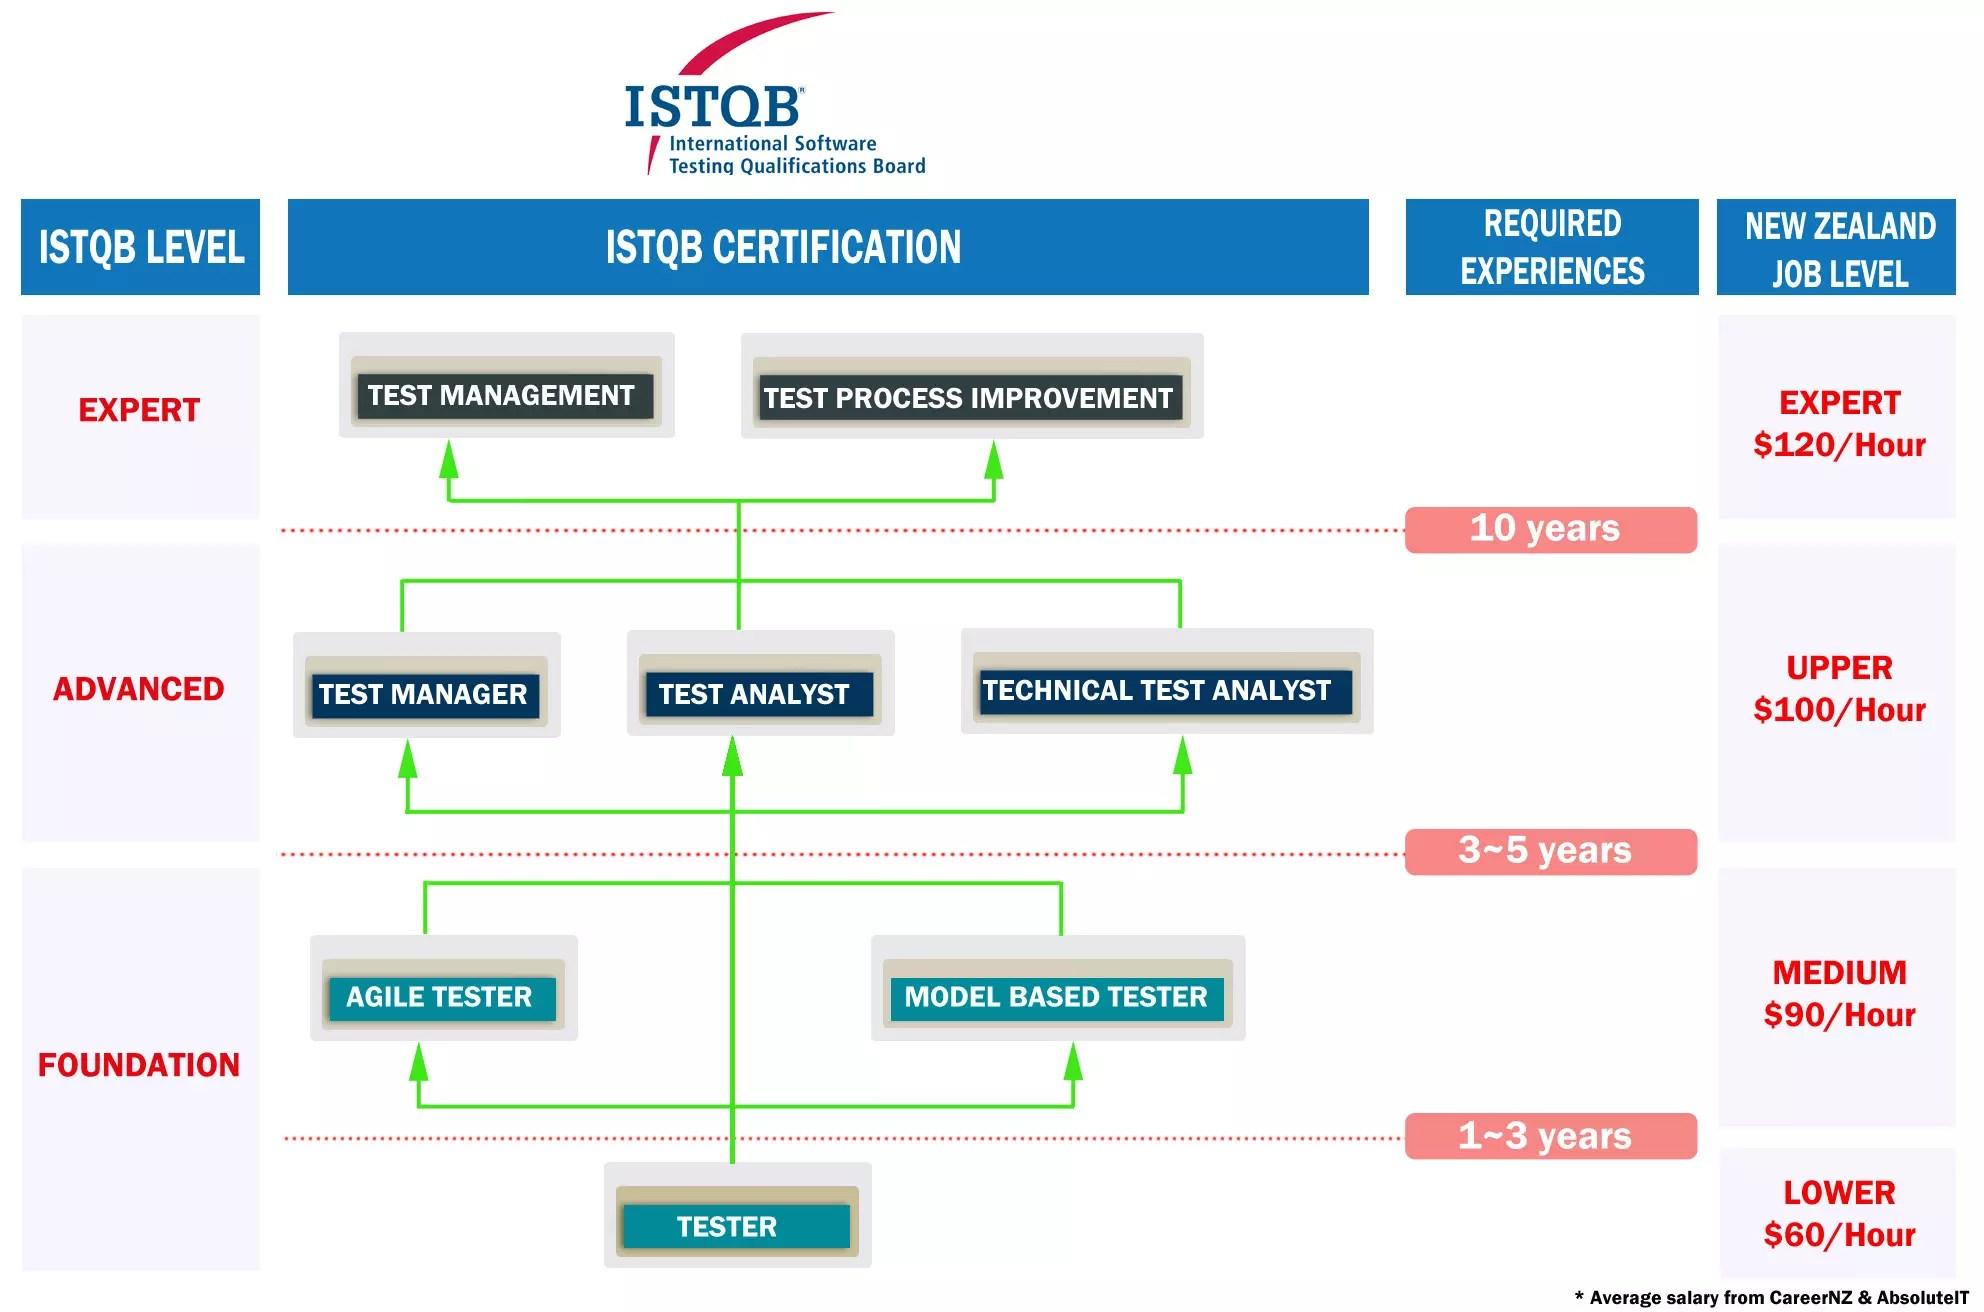 Istqb certification overview aiit istqb certification overview xflitez Images